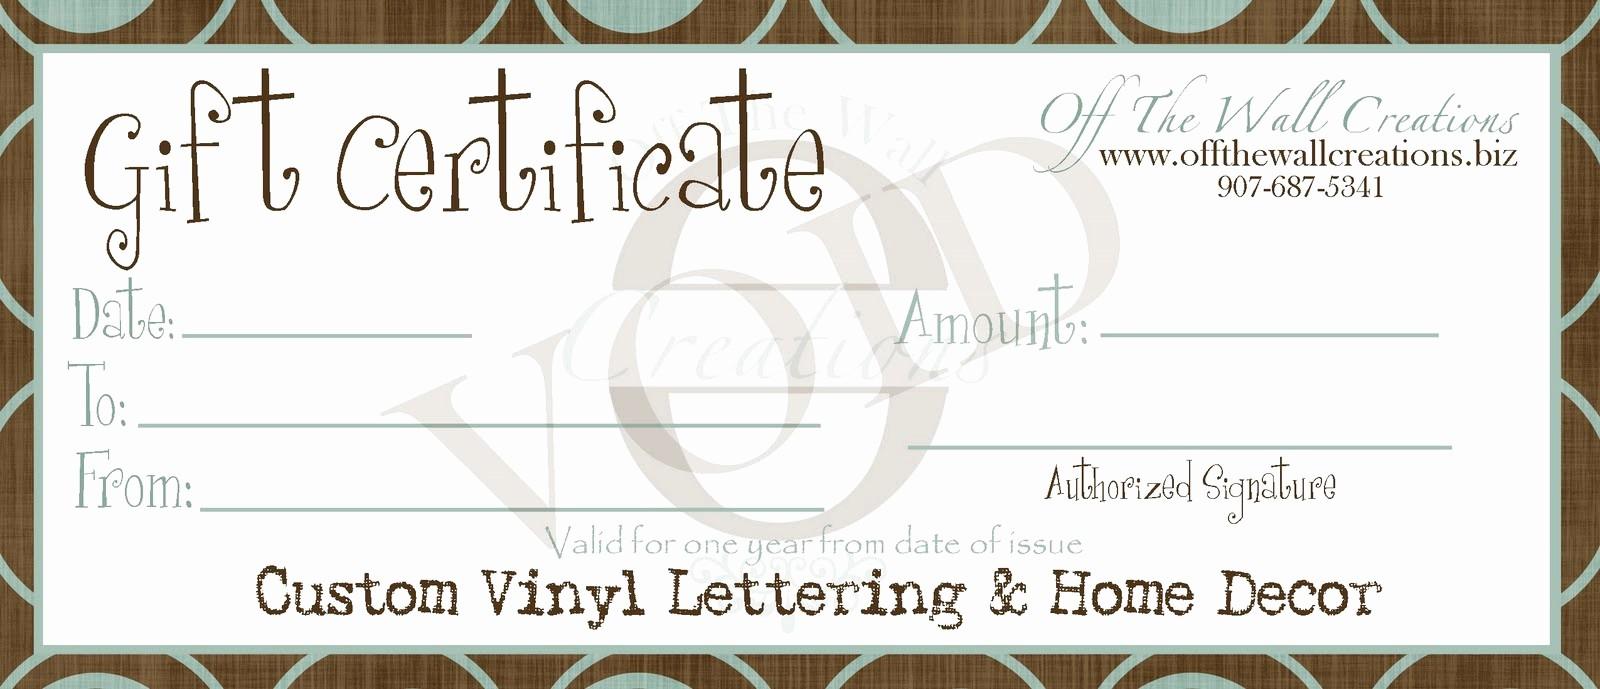 Generic Gift Certificates Print Free Luxury Printable Generic Gift Certificates